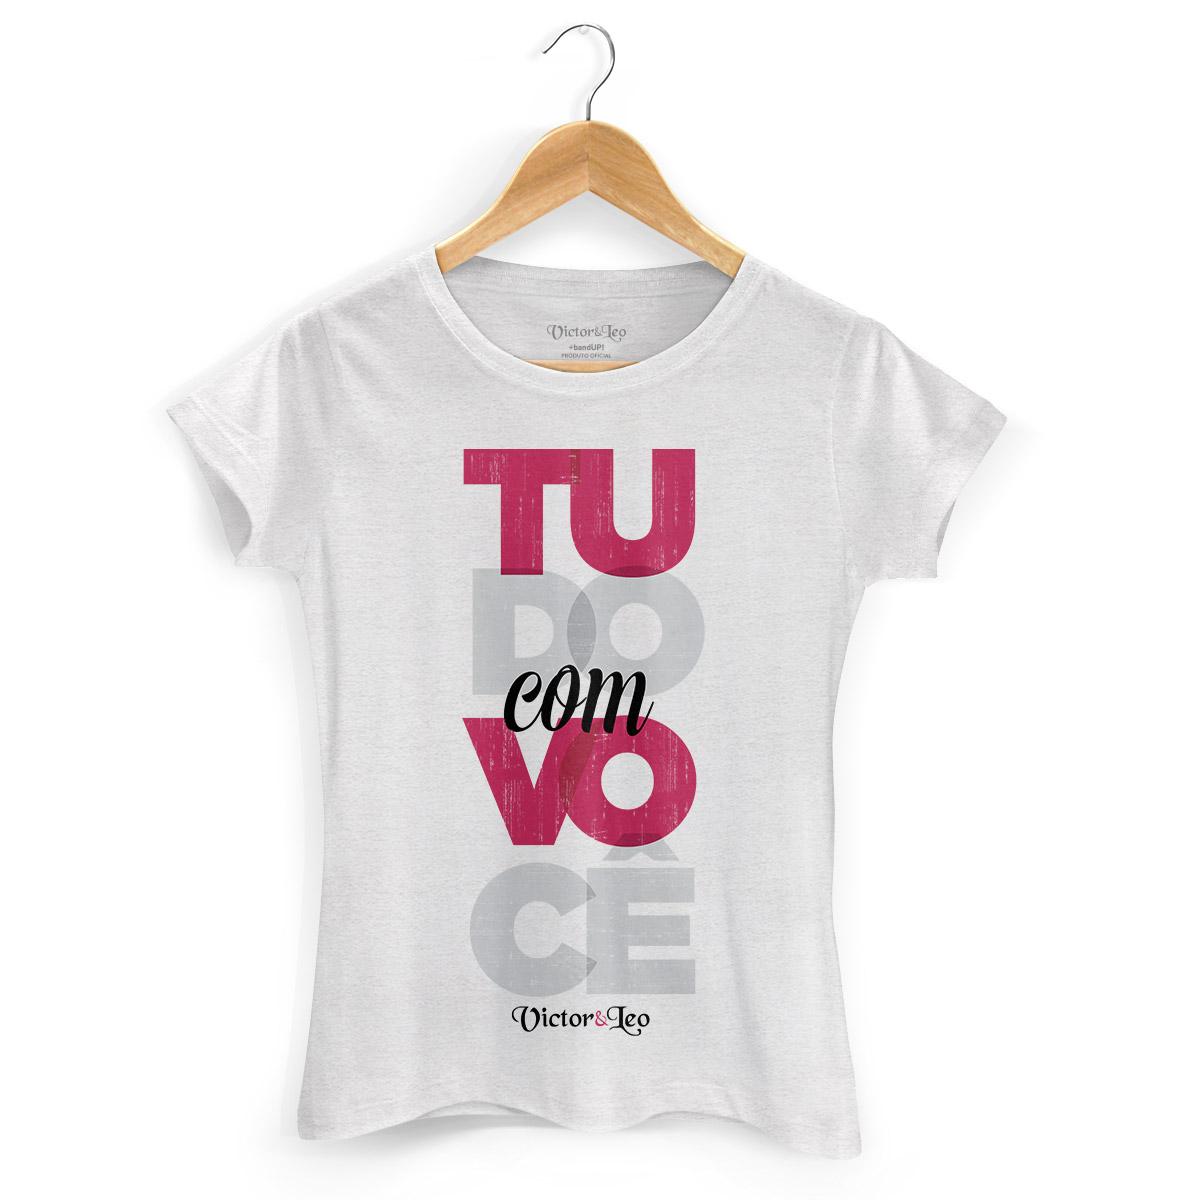 Camiseta Feminina Victor & Leo Tudo Com Voc�